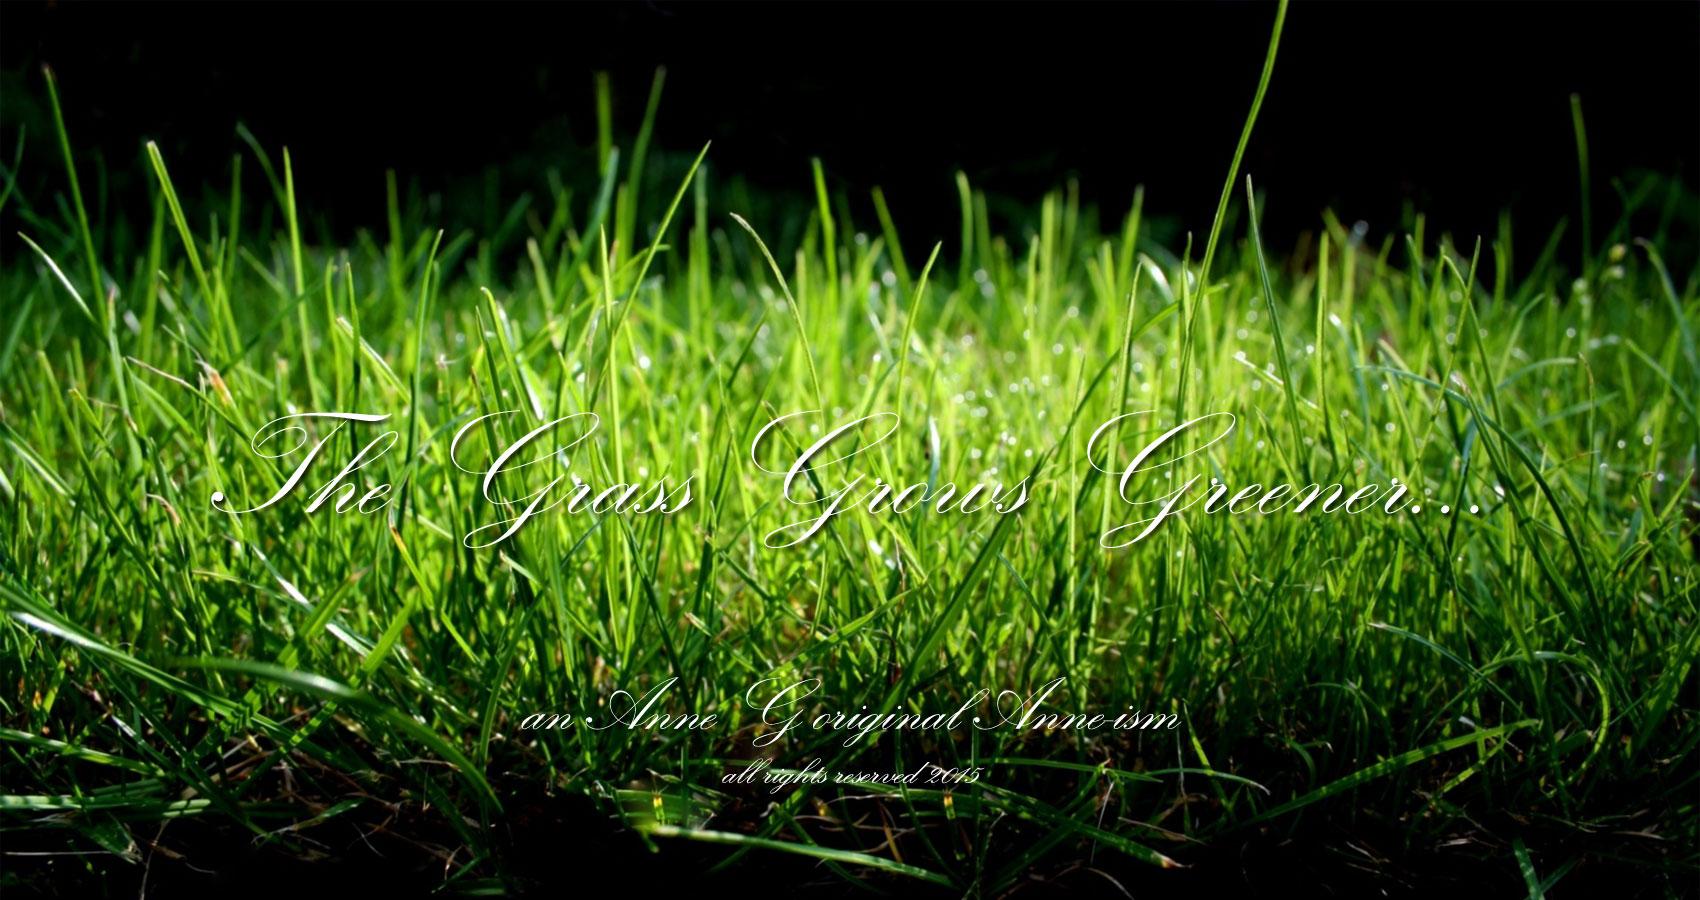 spillwords.com The Grass Is Greener An Anne G Original Anne-ism